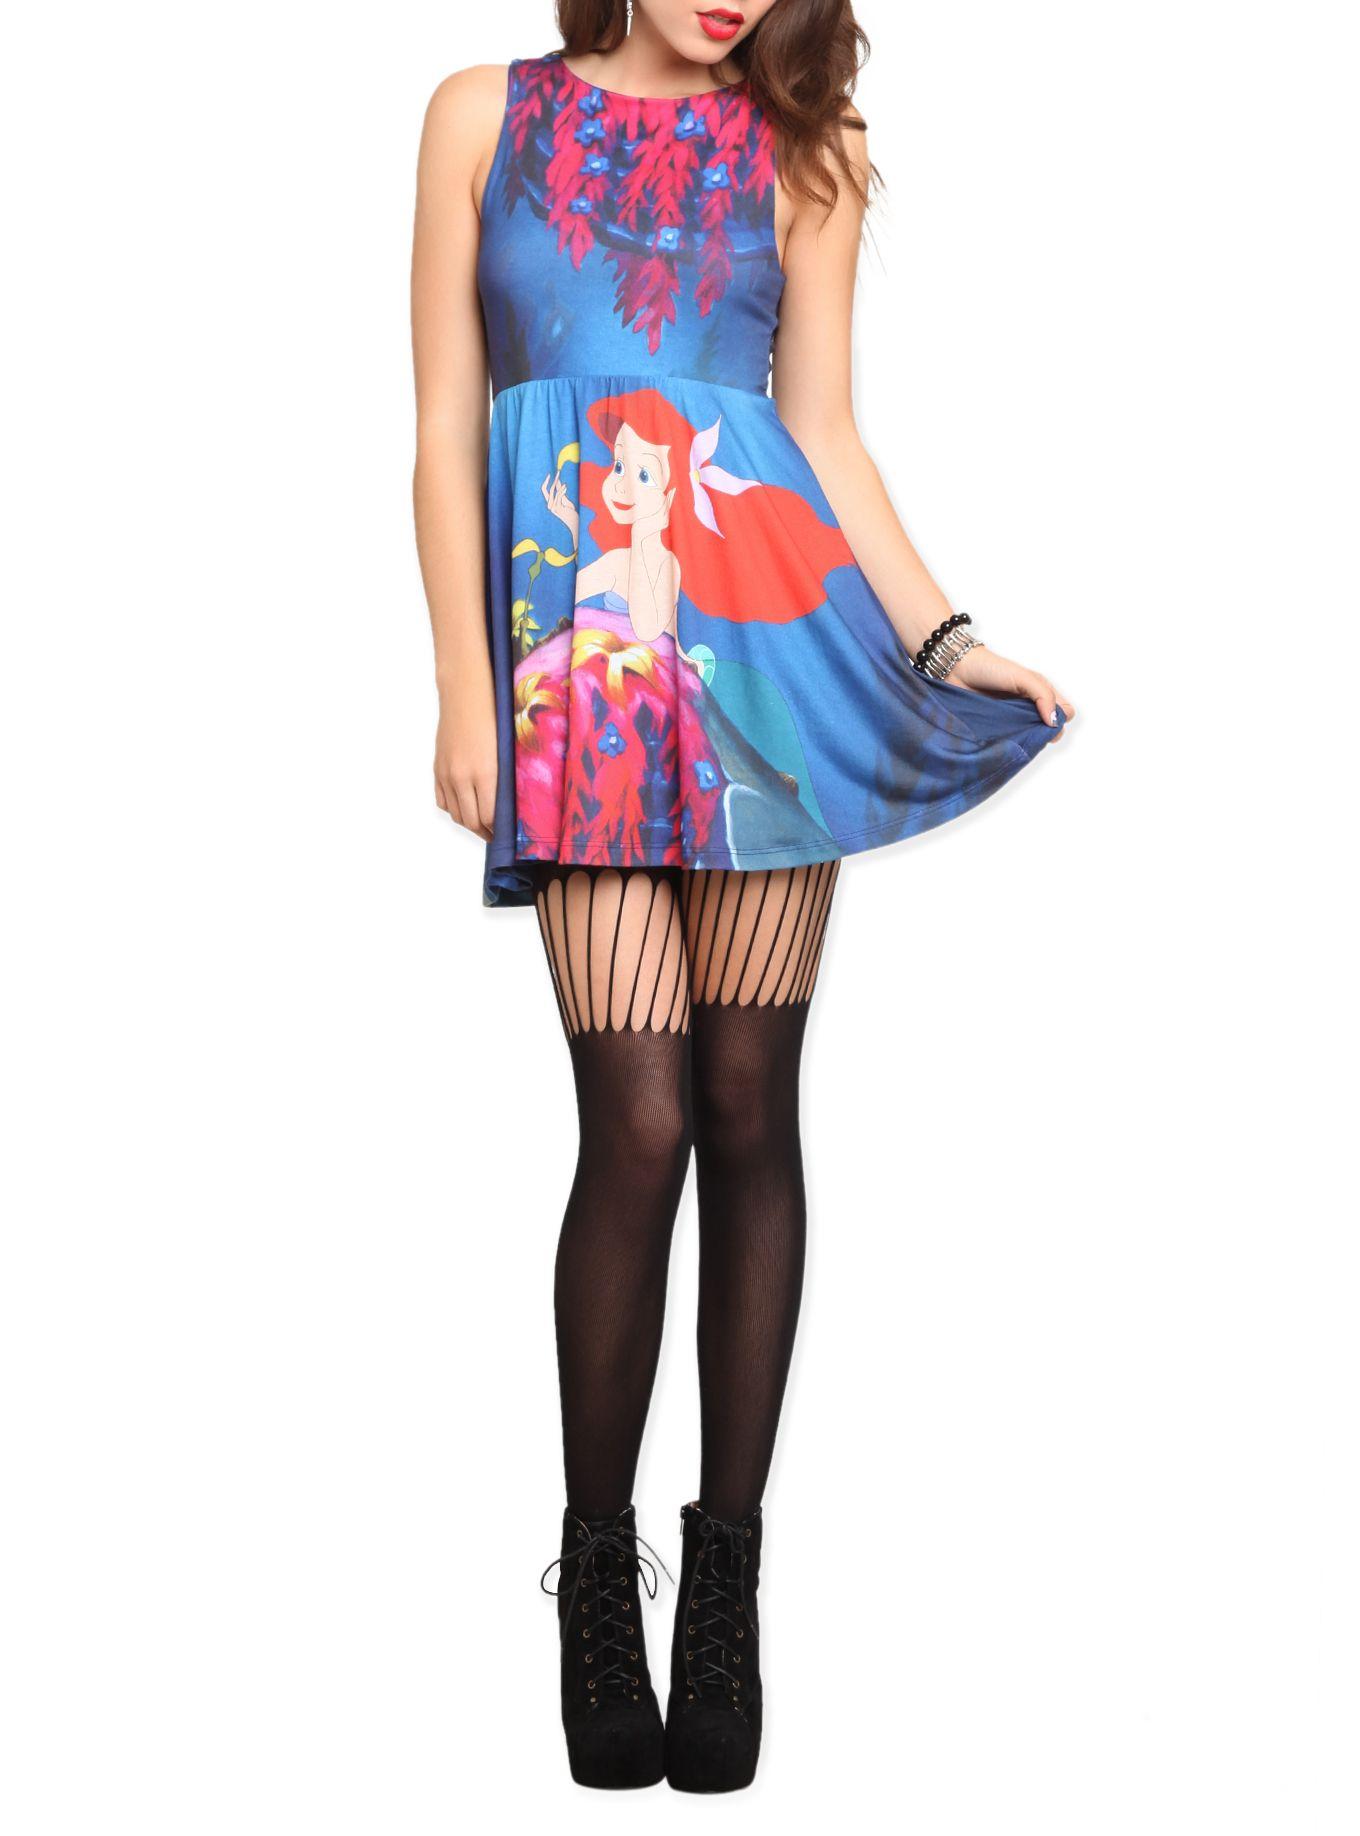 Dresses skirts clothes women disney store - Disney The Little Mermaid Ariel Dress Hot Topic